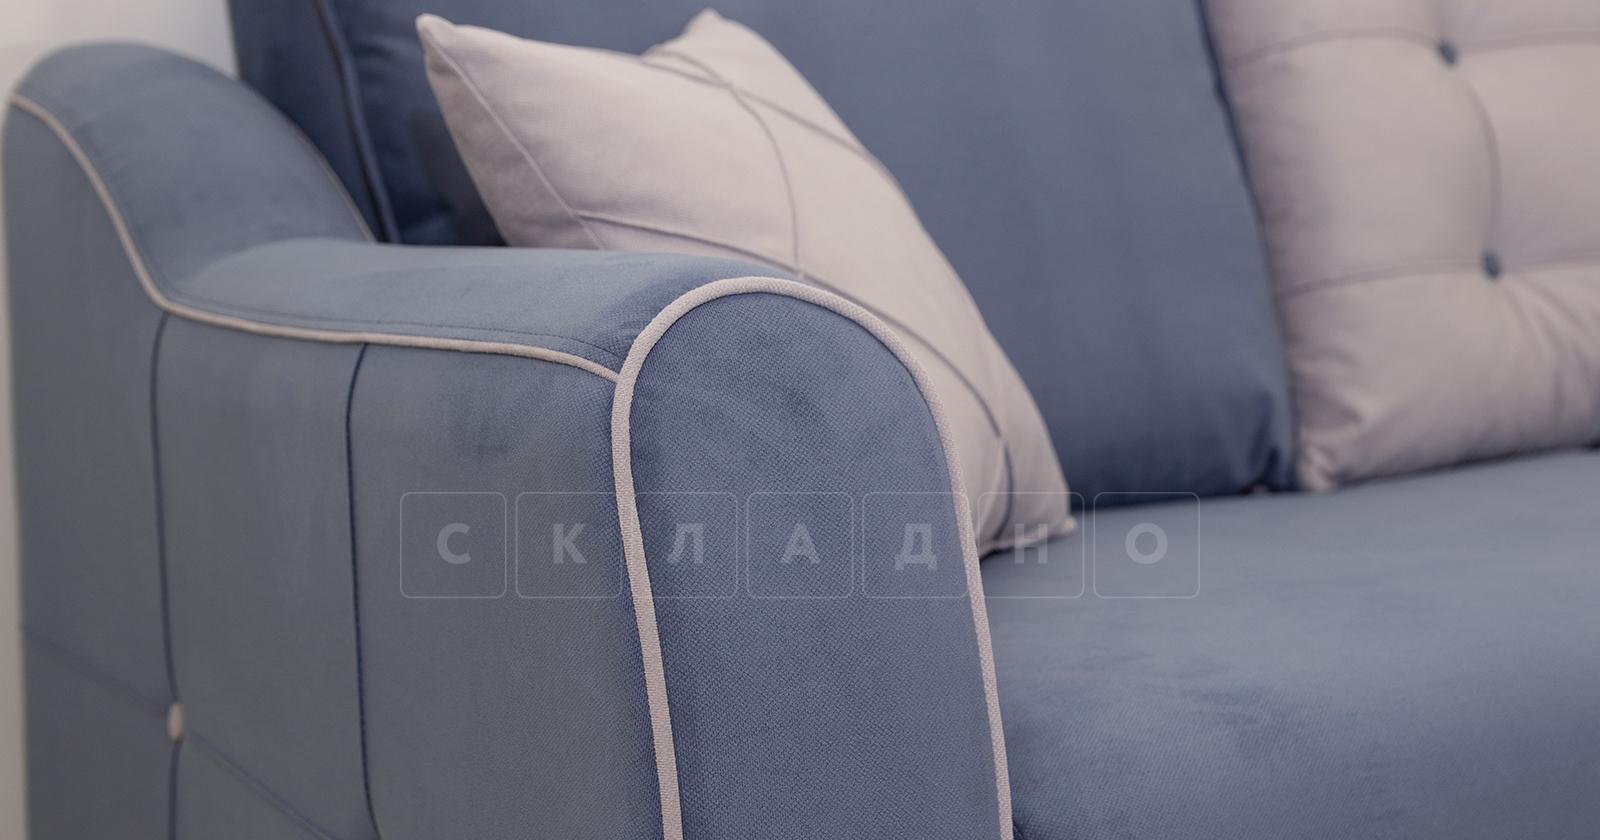 Диван-кровать Флэтфорд серо-синий фото 6 | интернет-магазин Складно